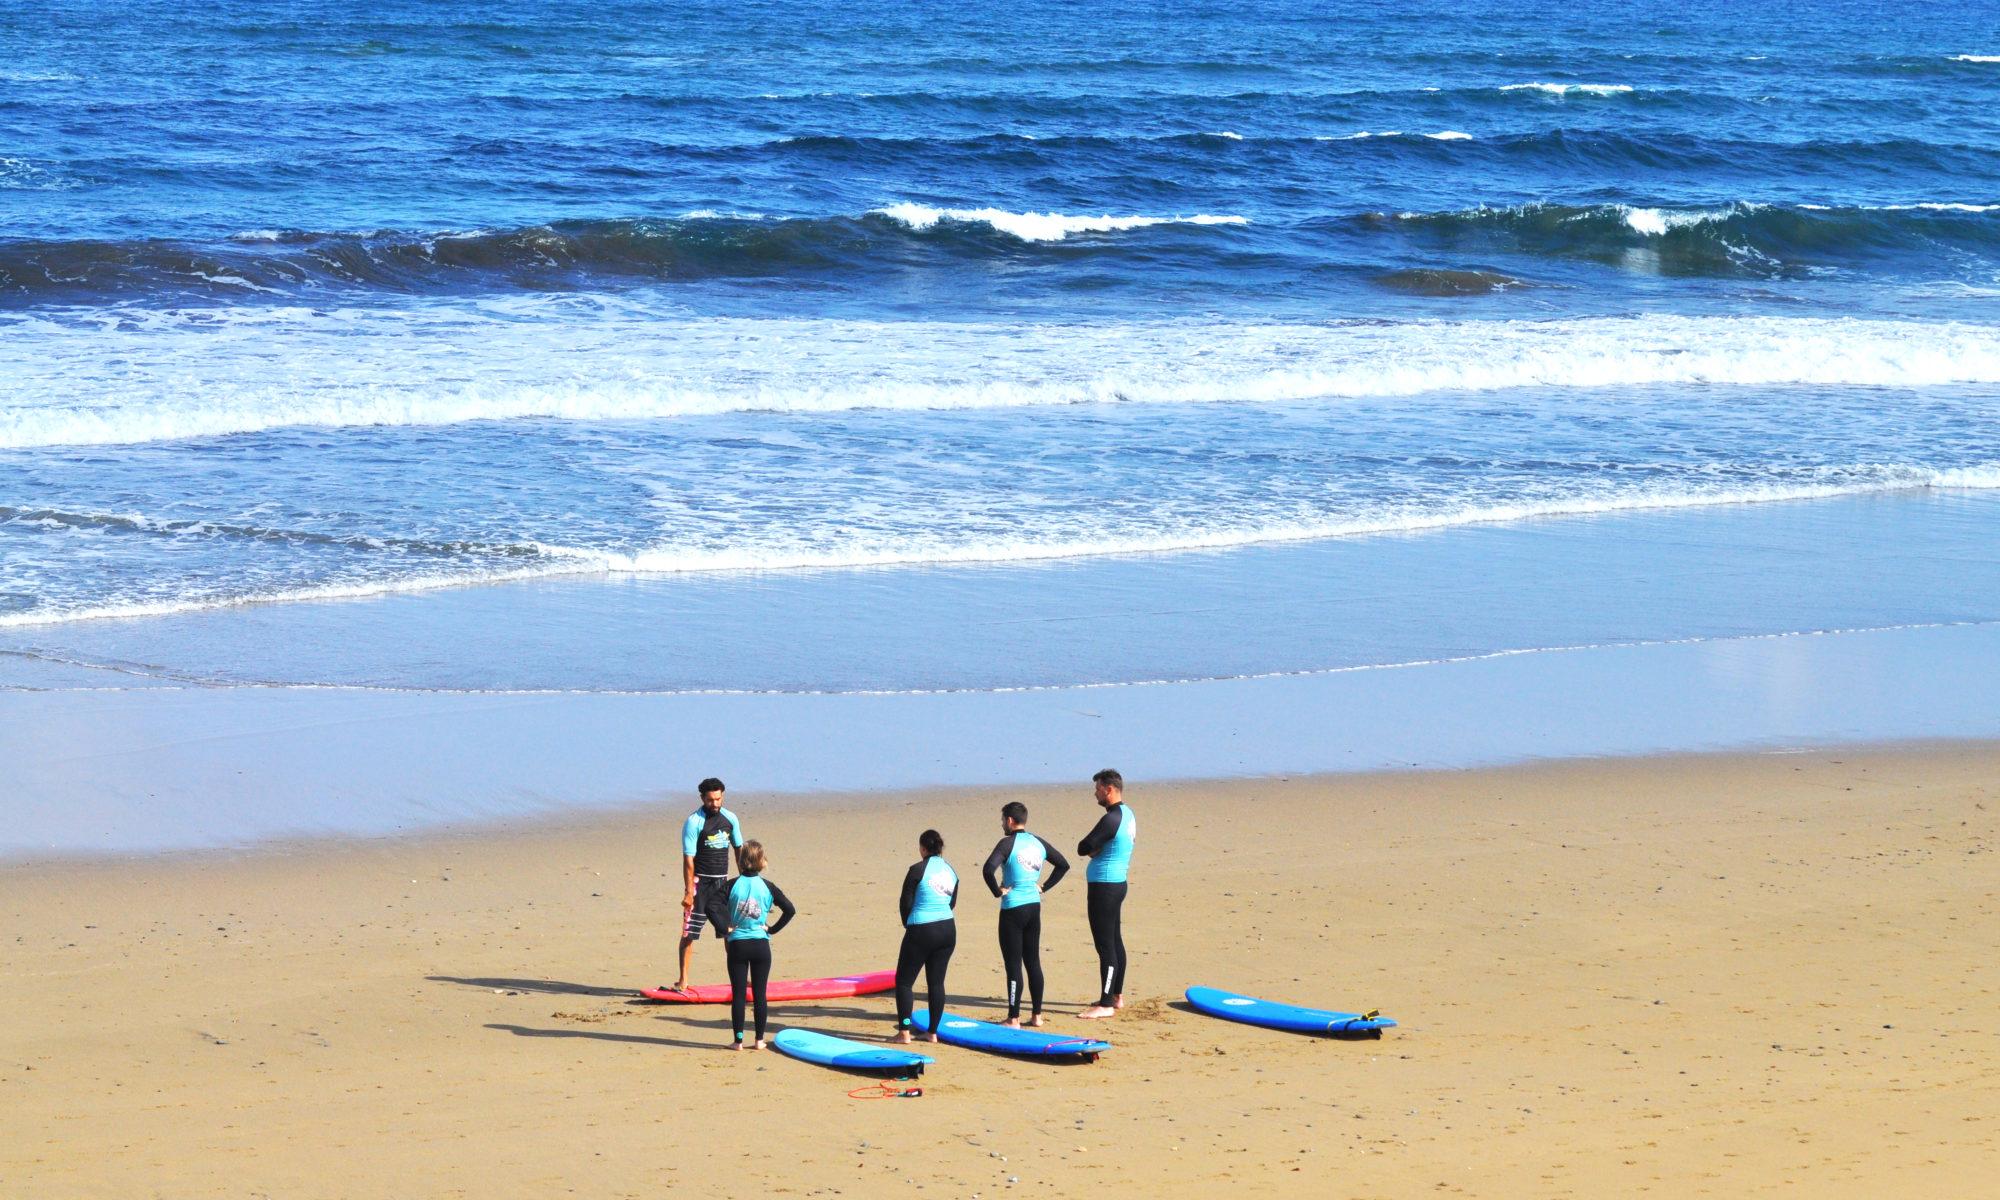 nauka surfingu zima